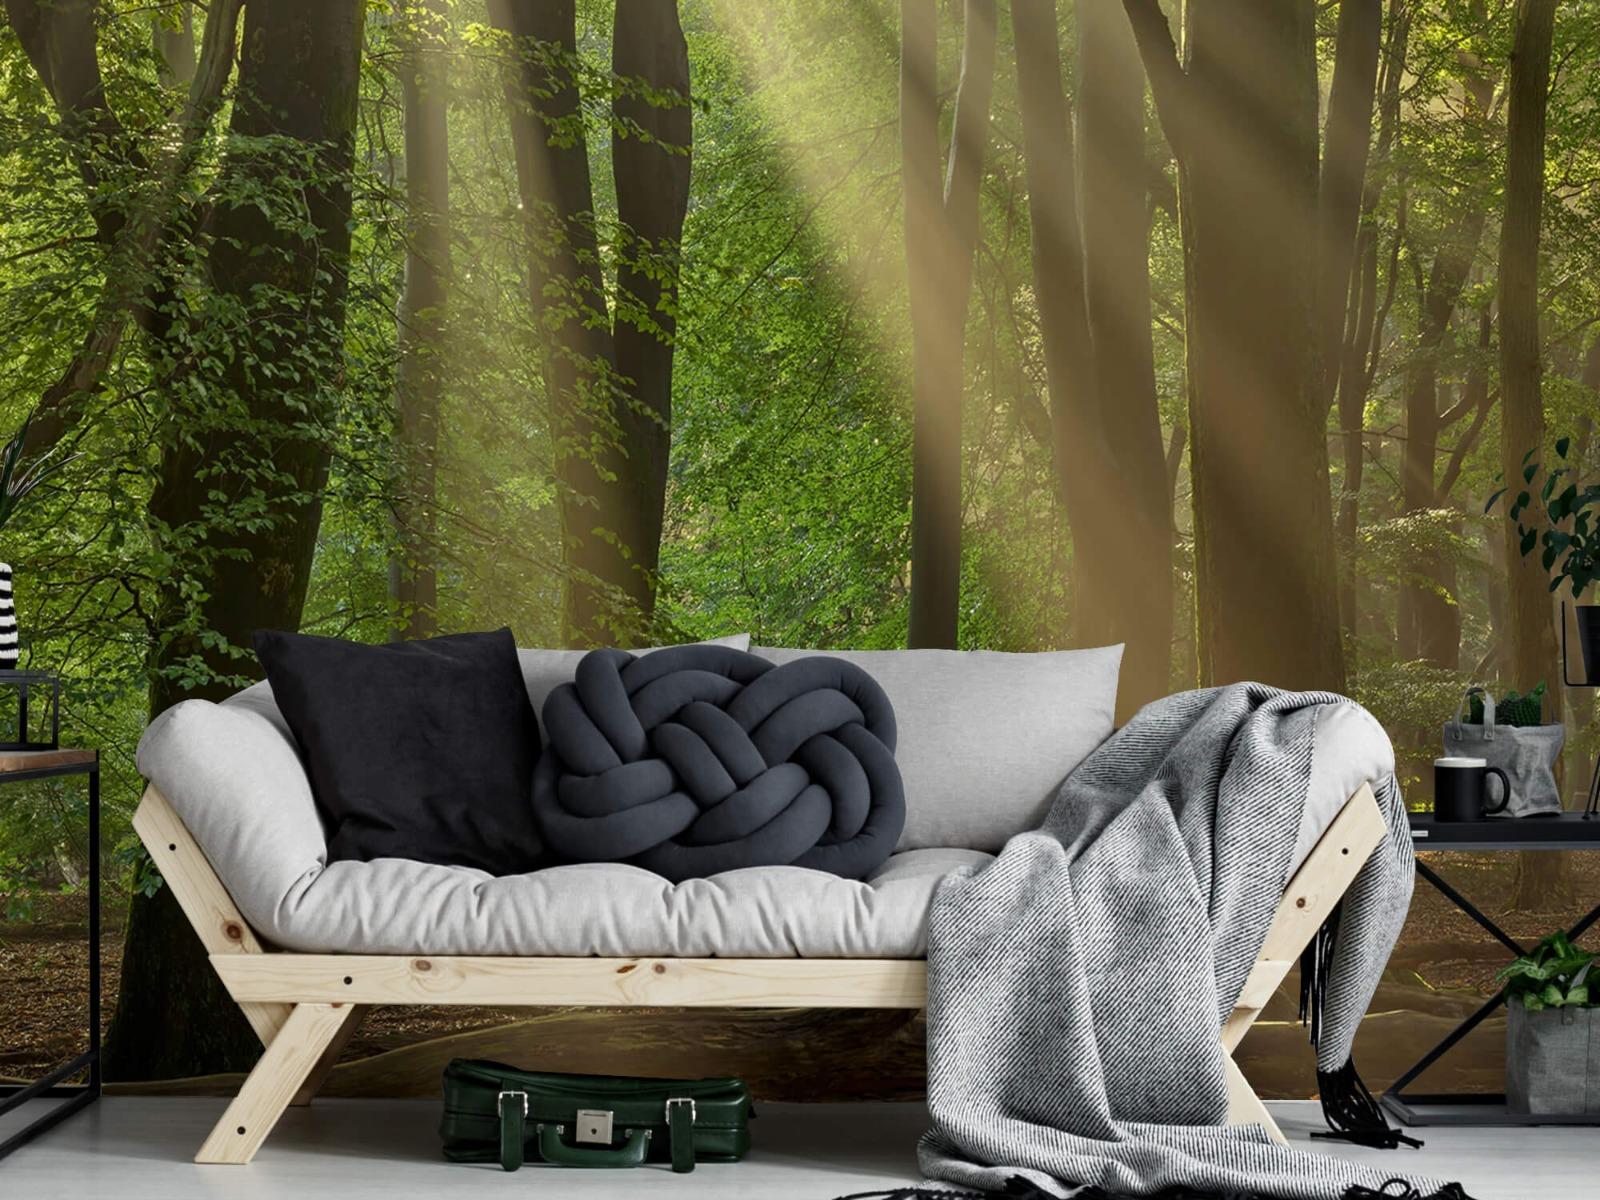 Bomen - Zonneharpen in het bos - Slaapkamer 4